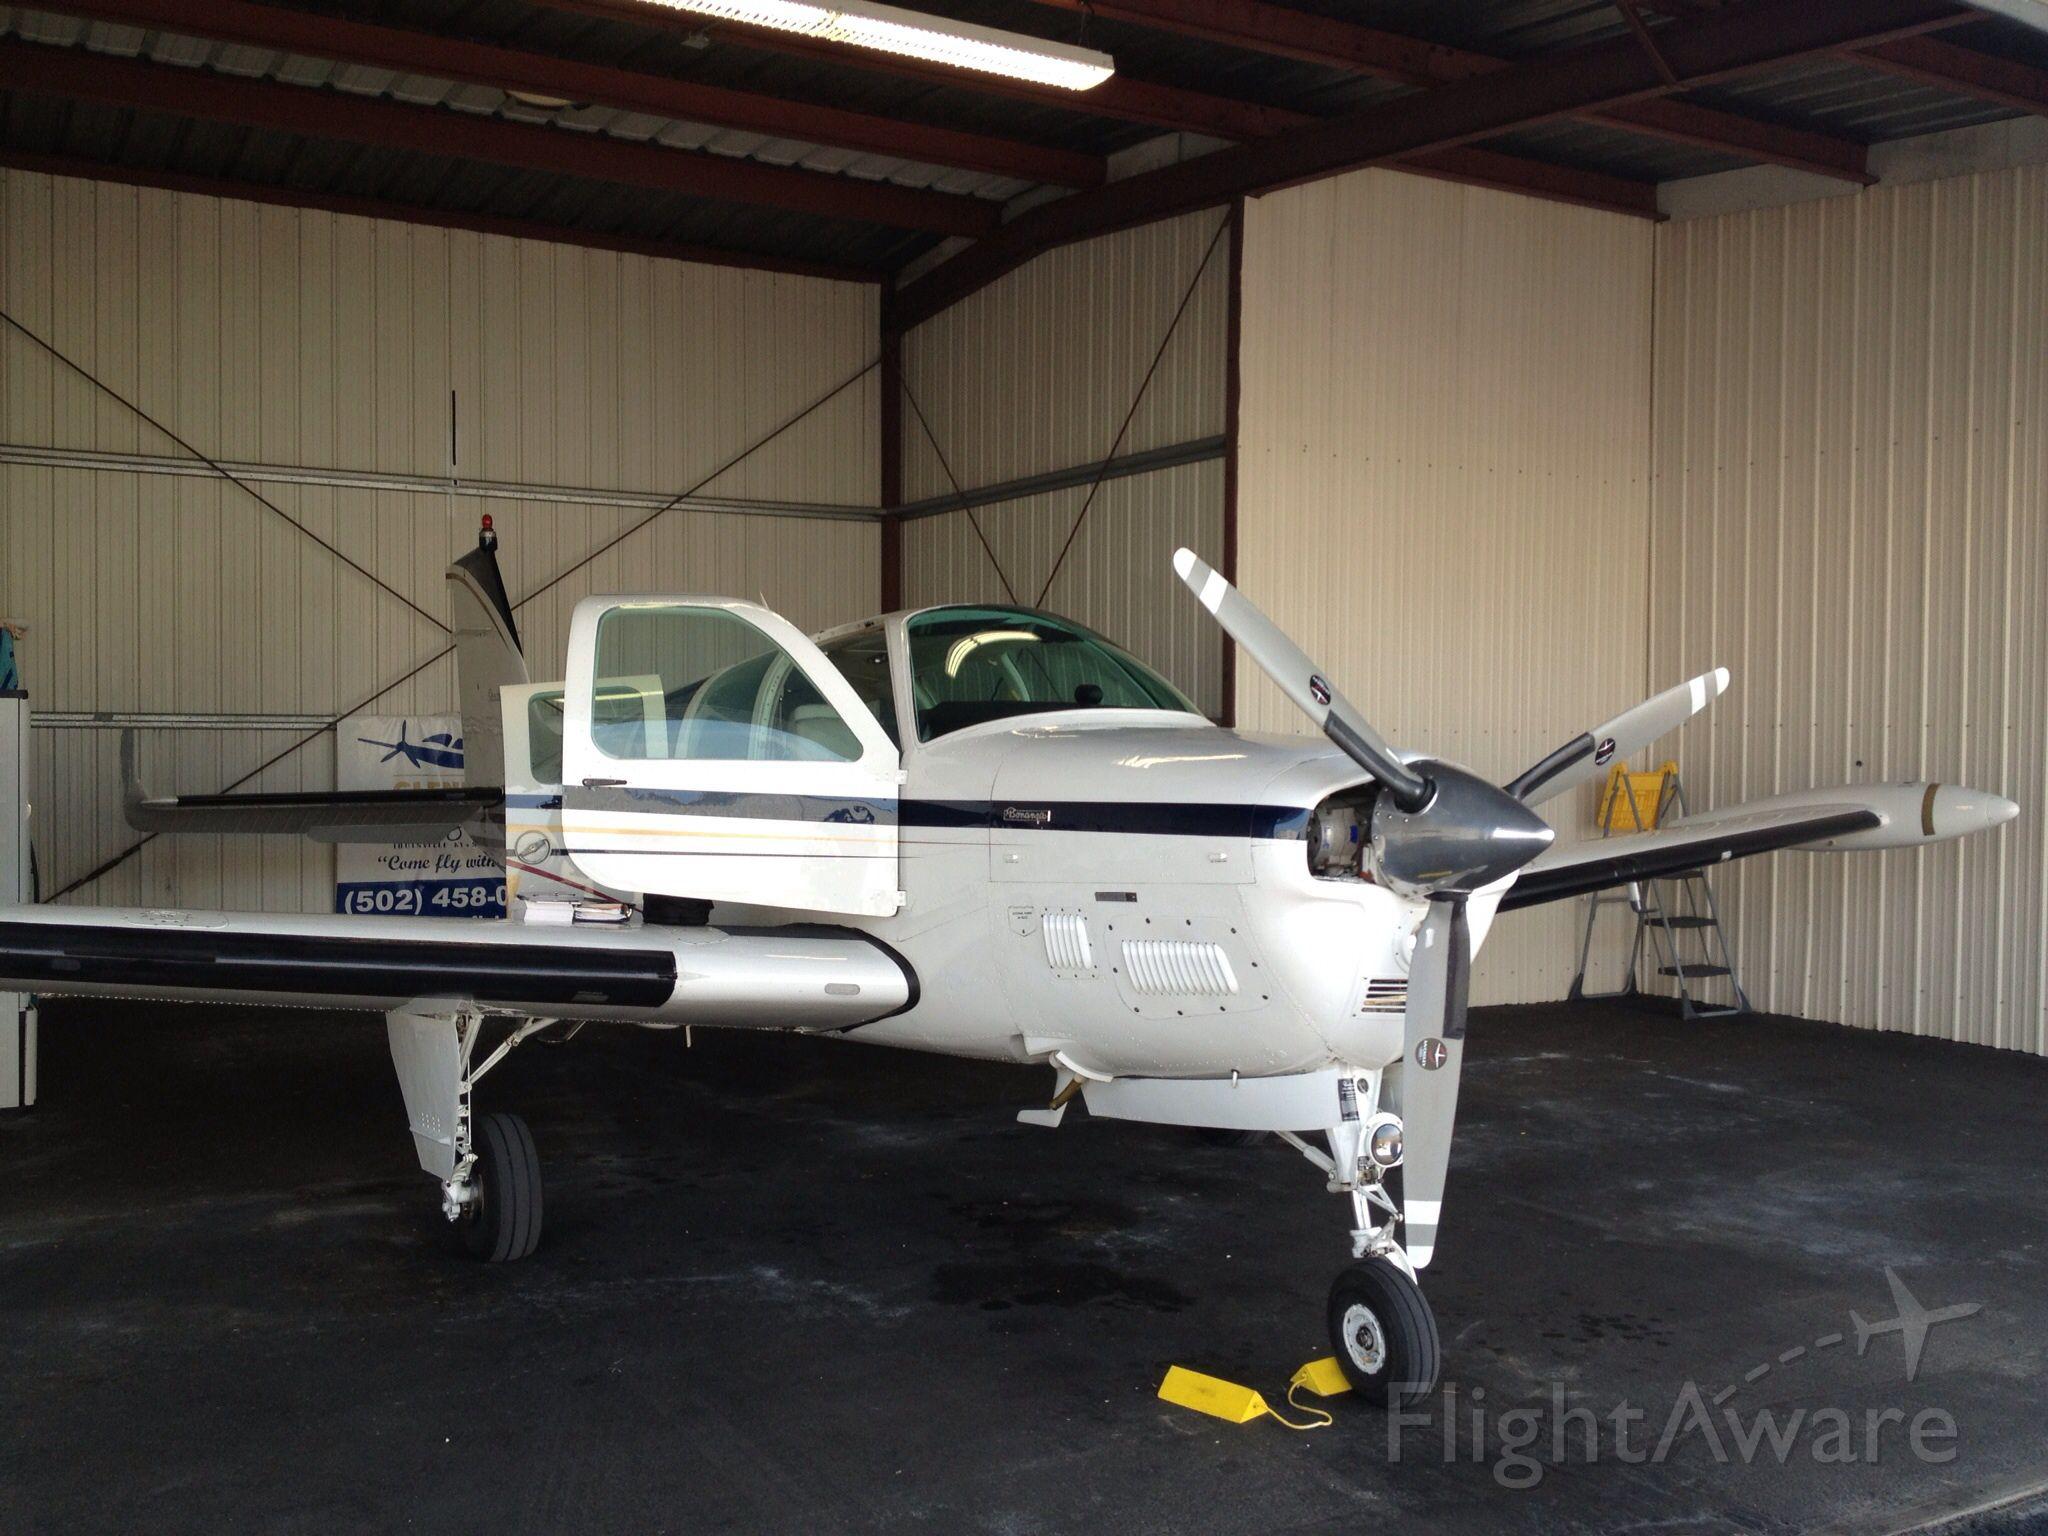 N6672X — - At the hangar